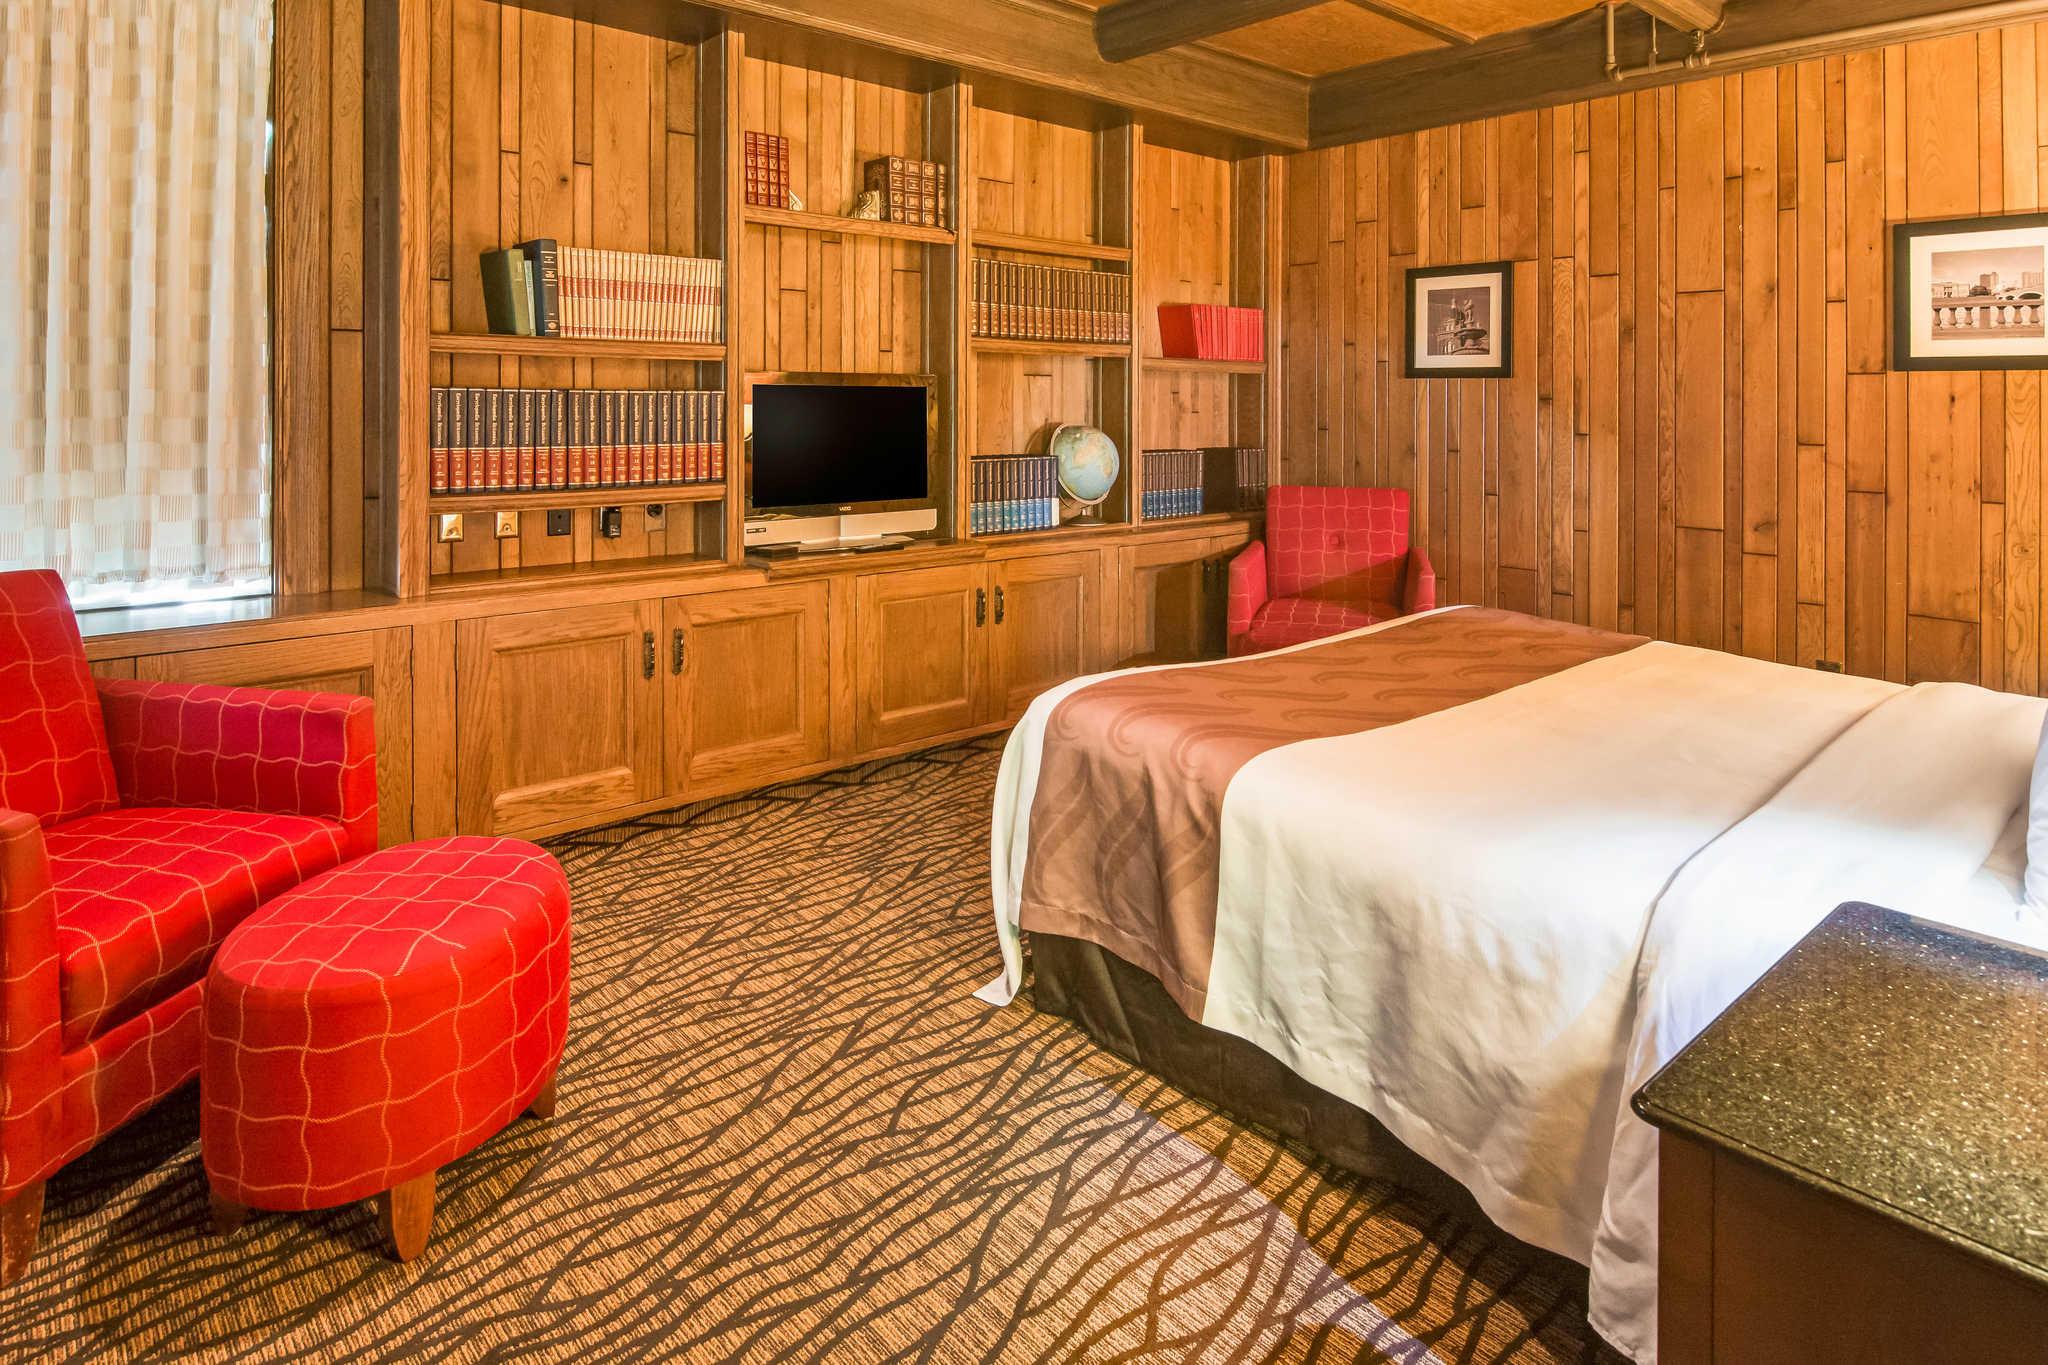 Quality Inn & Suites image 24